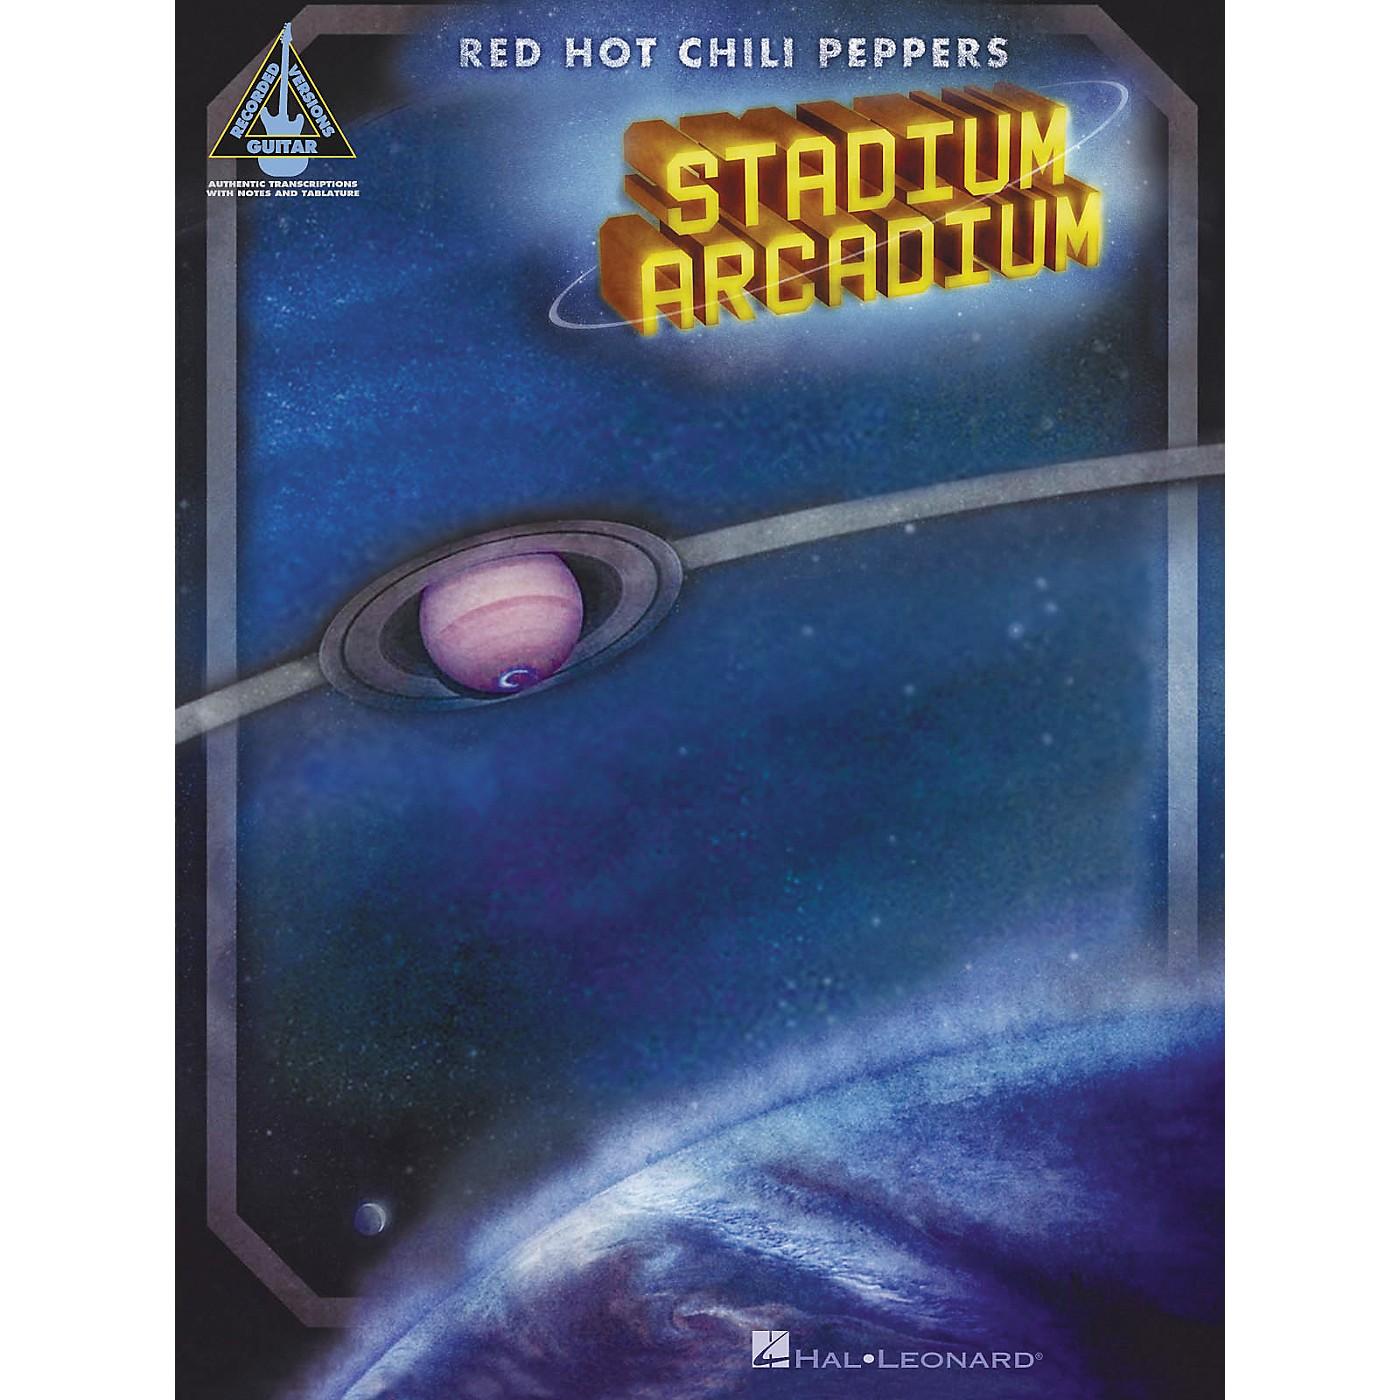 Hal Leonard Stadium Arcadium Red Hot Chili Peppers Guitar Tab Songbook thumbnail